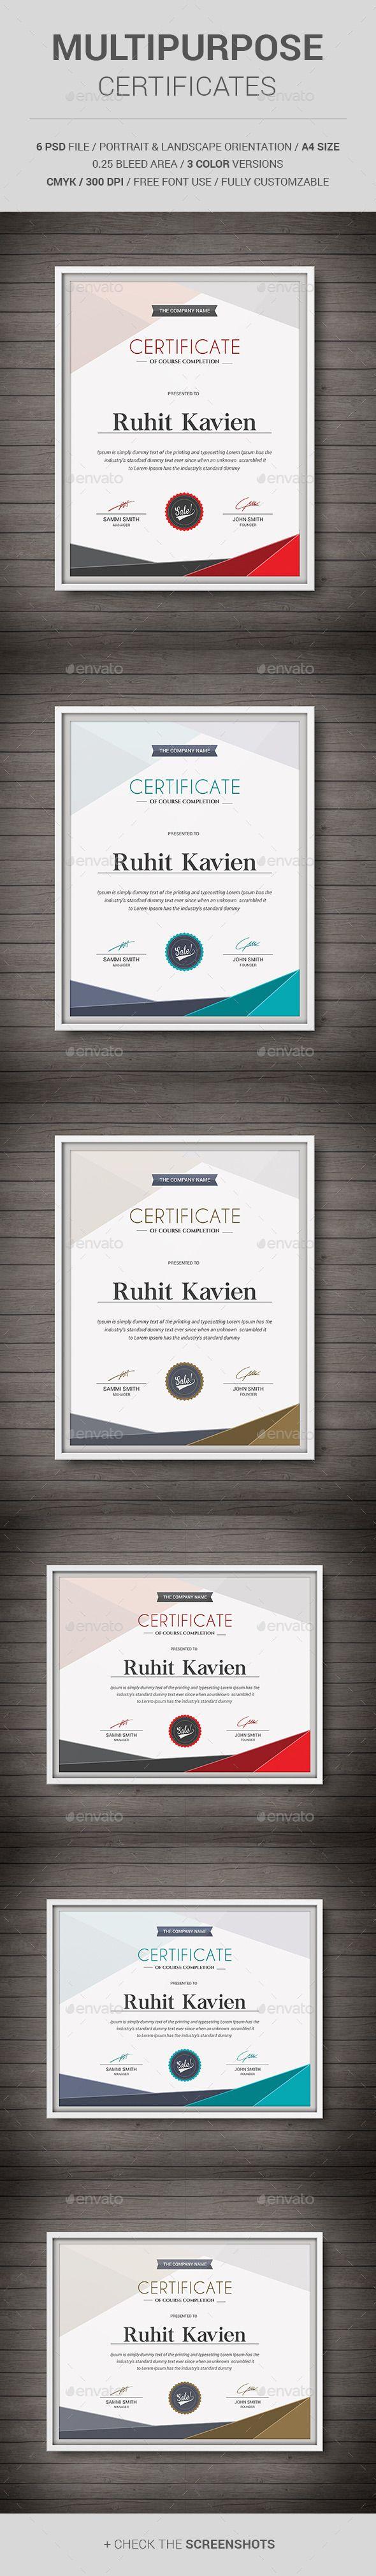 Multipurpose Certificates Template PSD. Download here: http://graphicriver.net/item/multipurpose-certificates/11513450?ref=ksioks